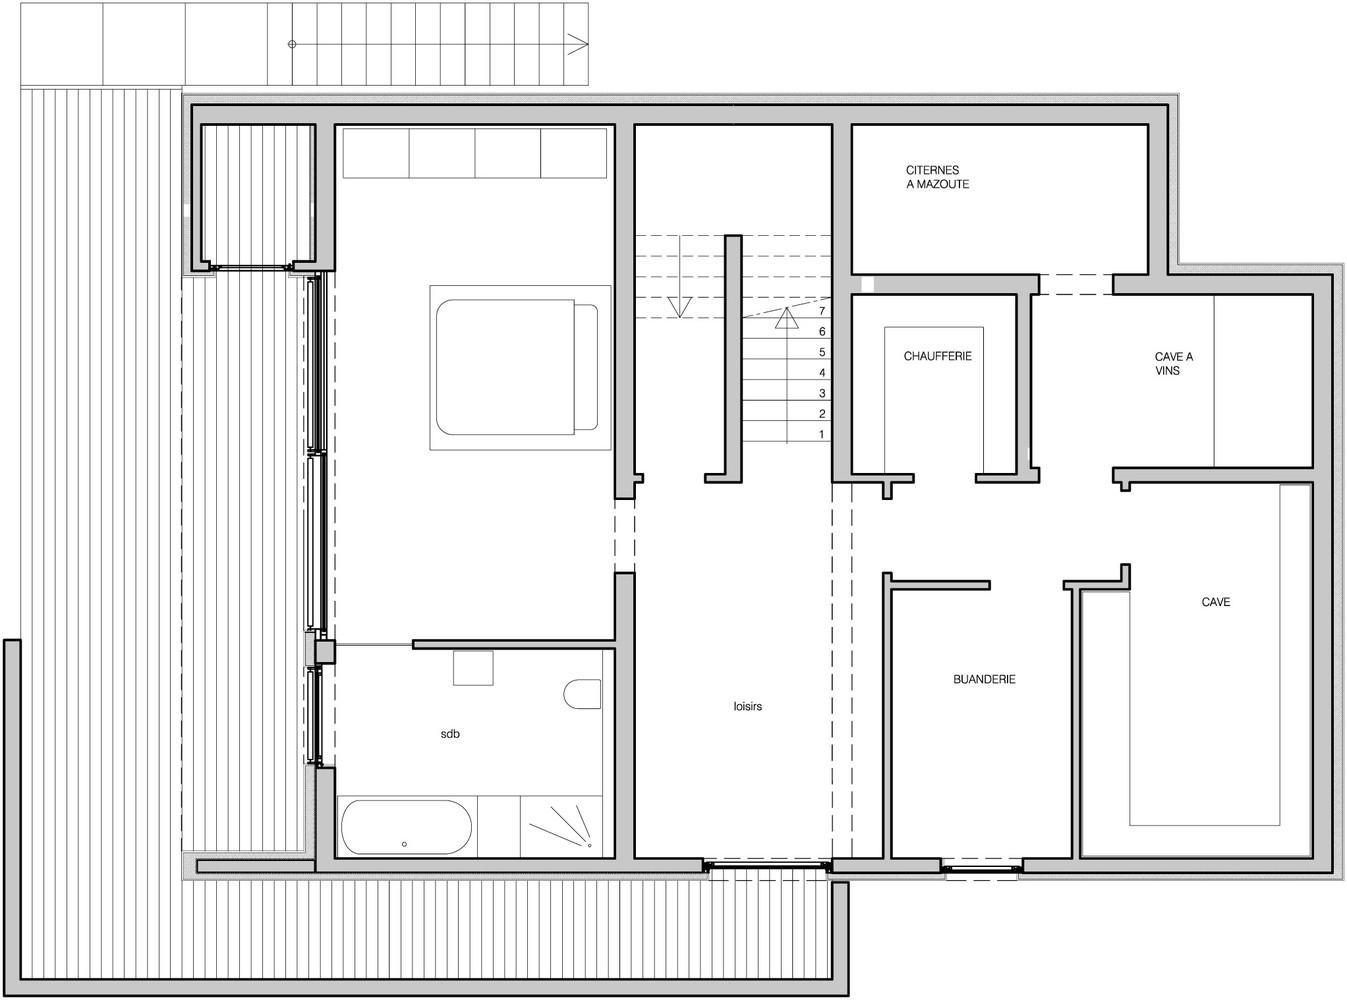 Plan Sdb   Xiamen Luxury Collection Hotel Project Design Plan Pinterest